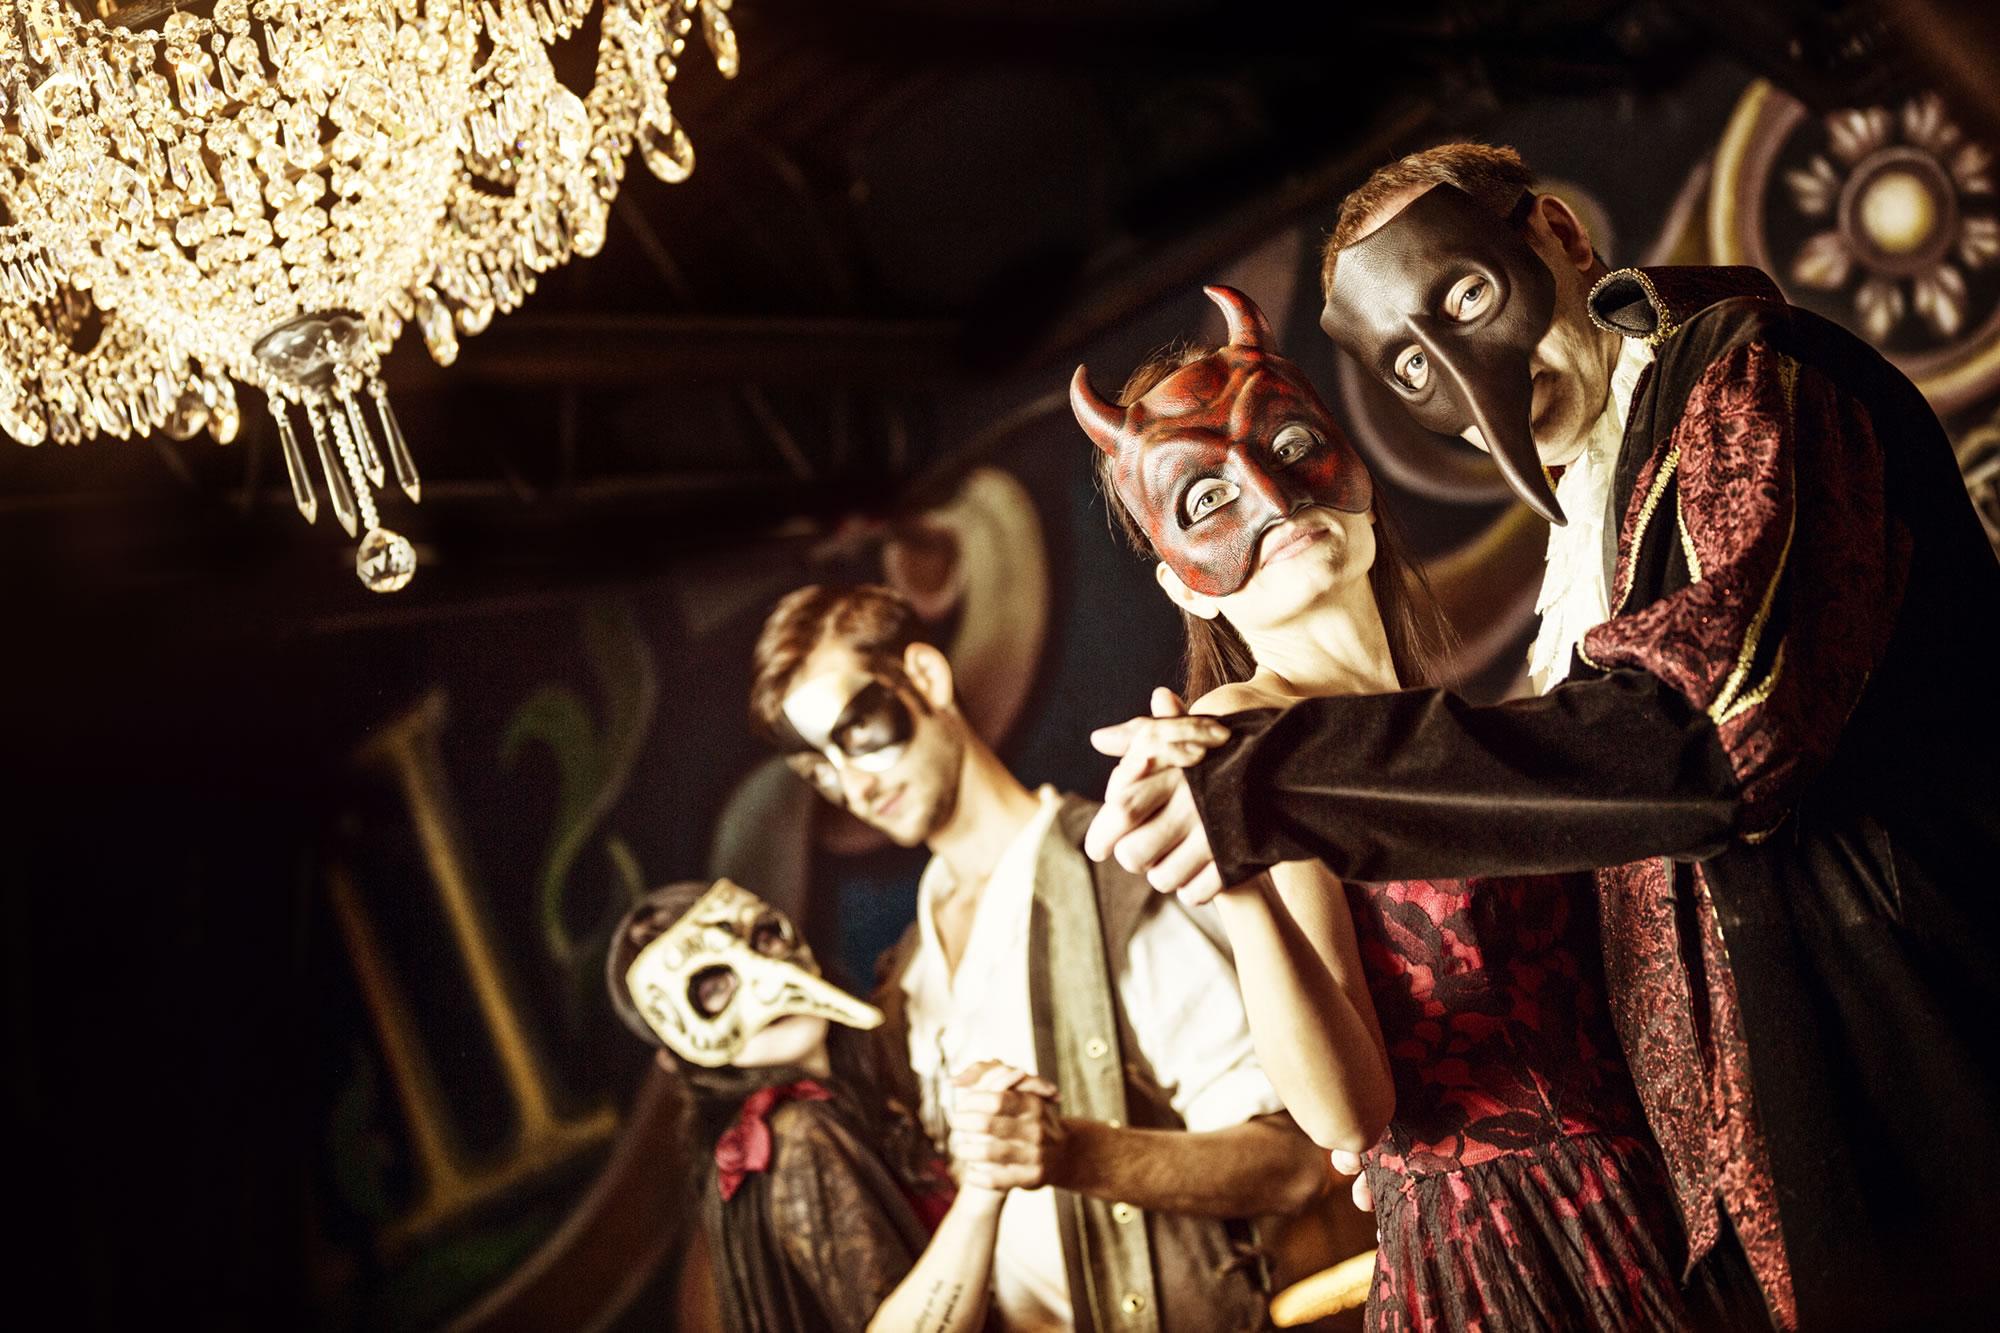 Try a Masquerade Ball